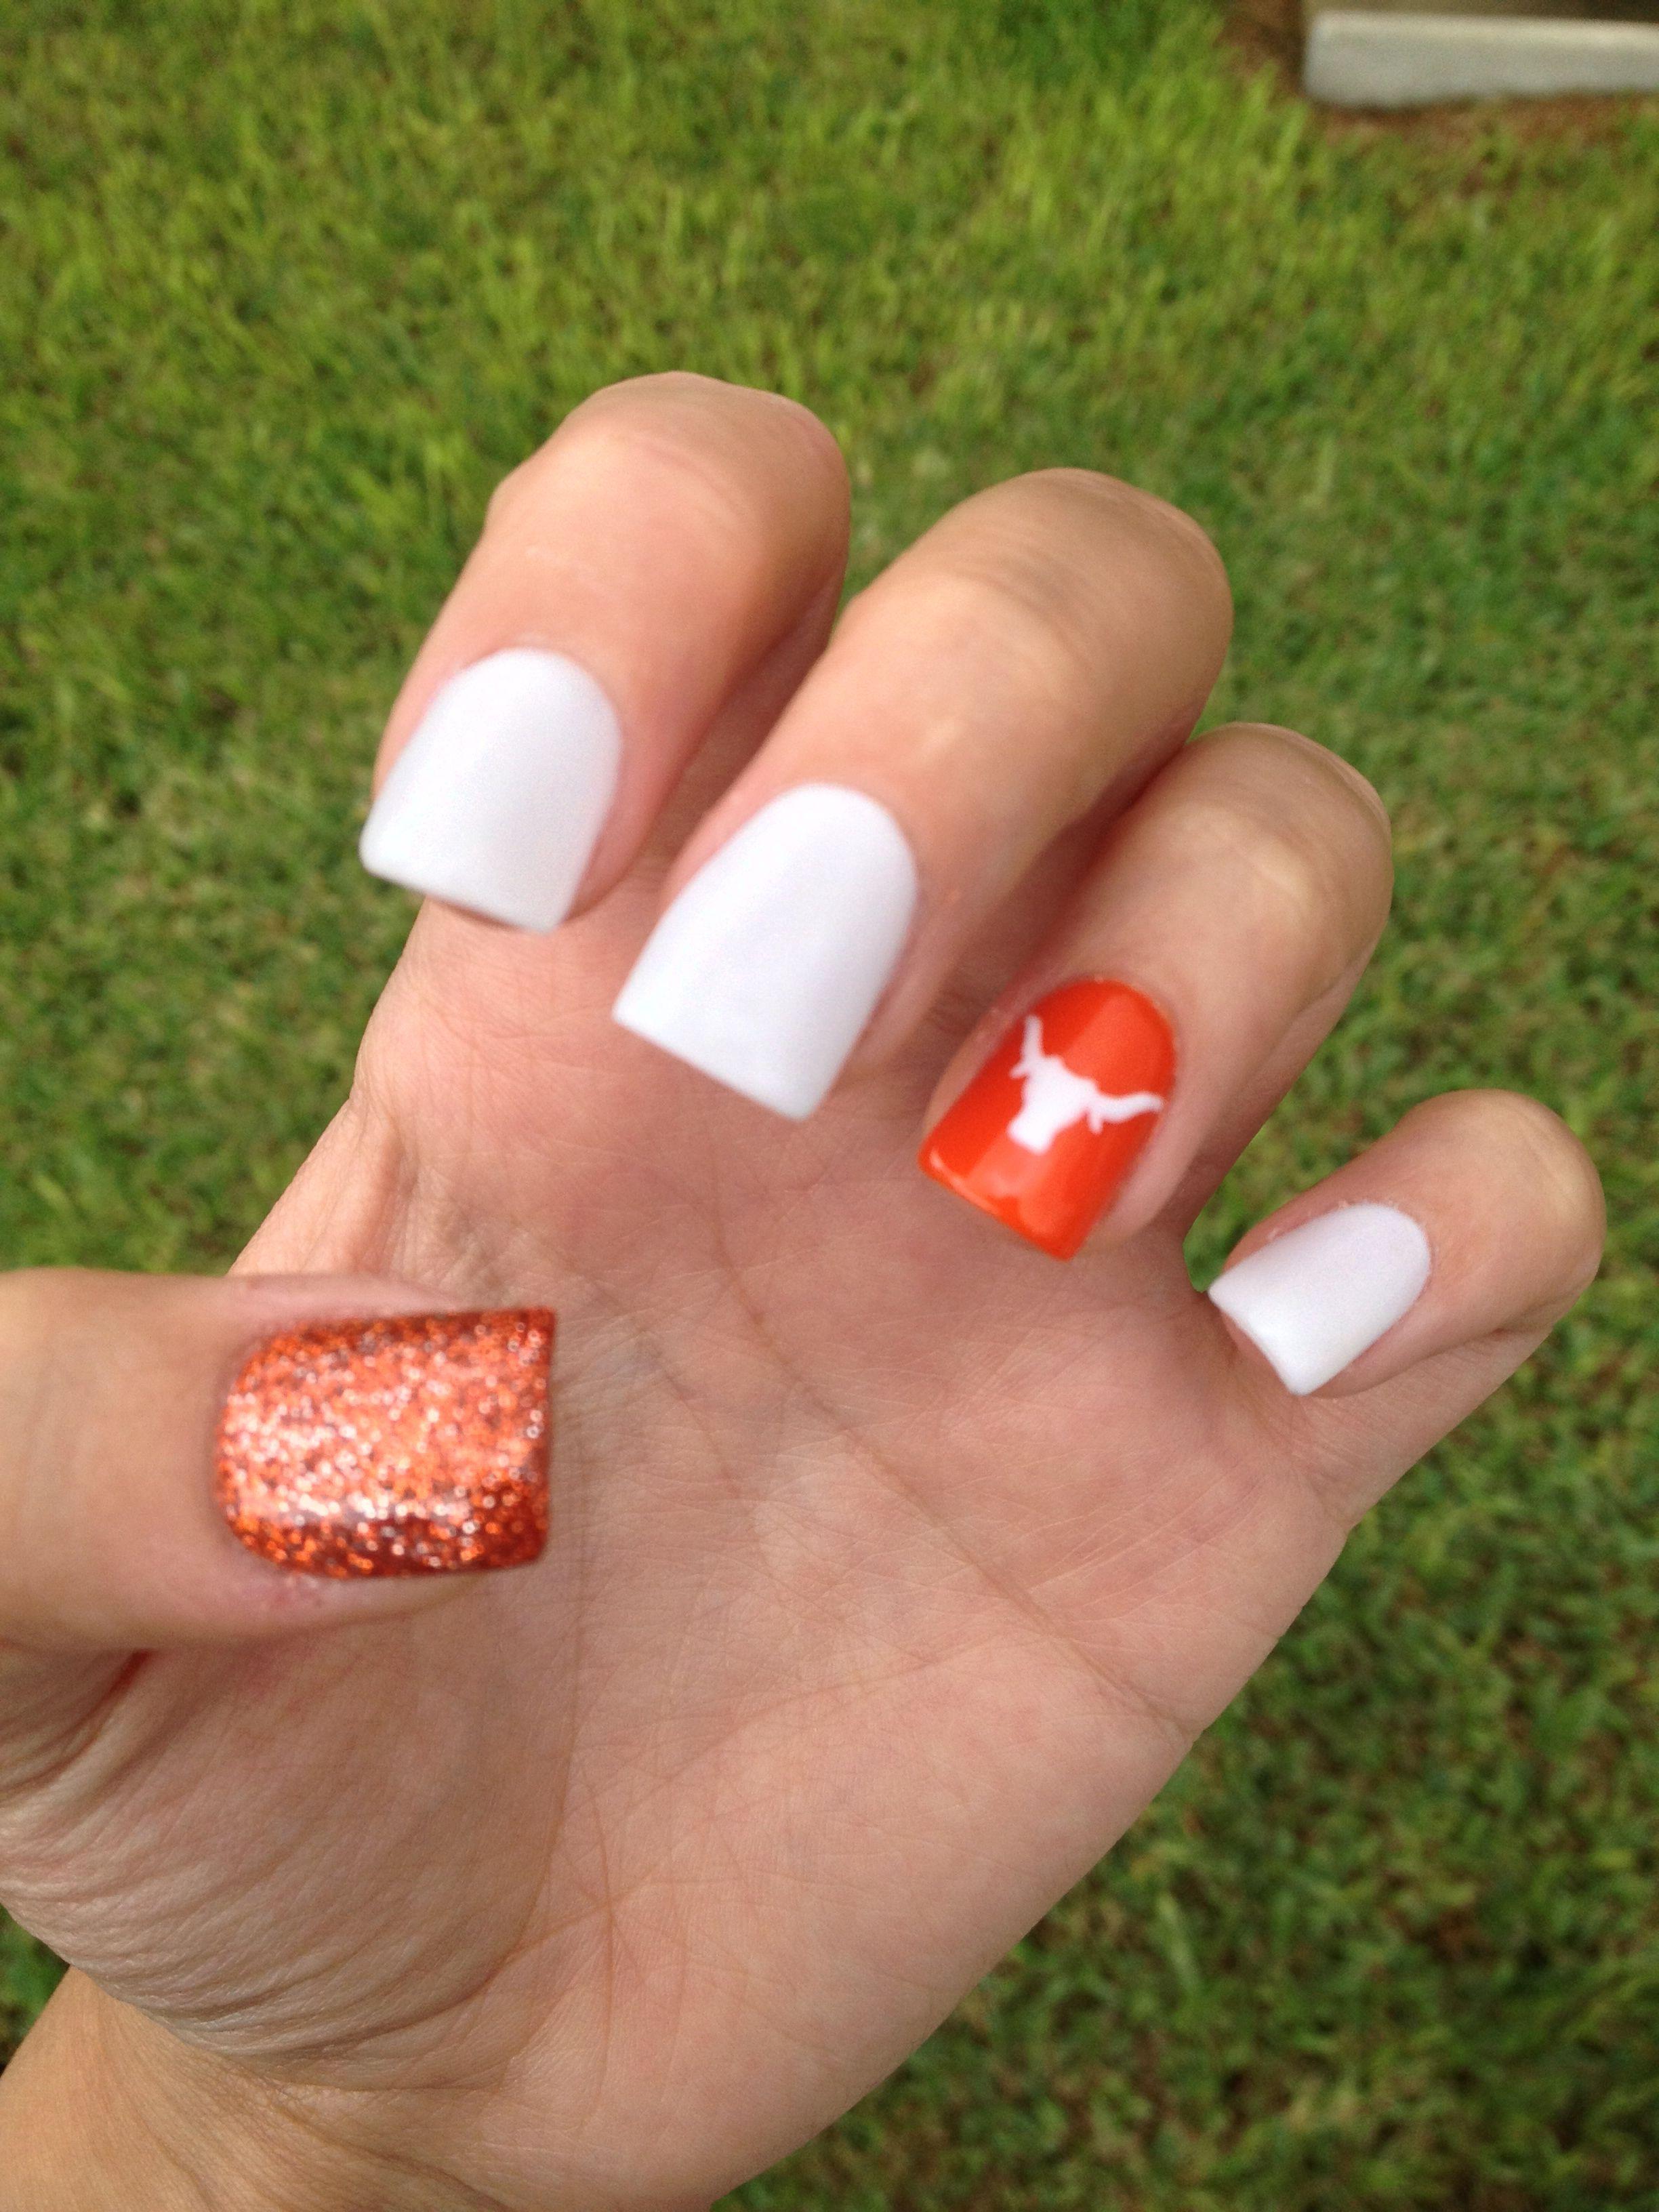 Pin by Anna Ortiz on Nail Art | Pinterest | Fun nails, Makeup and ...